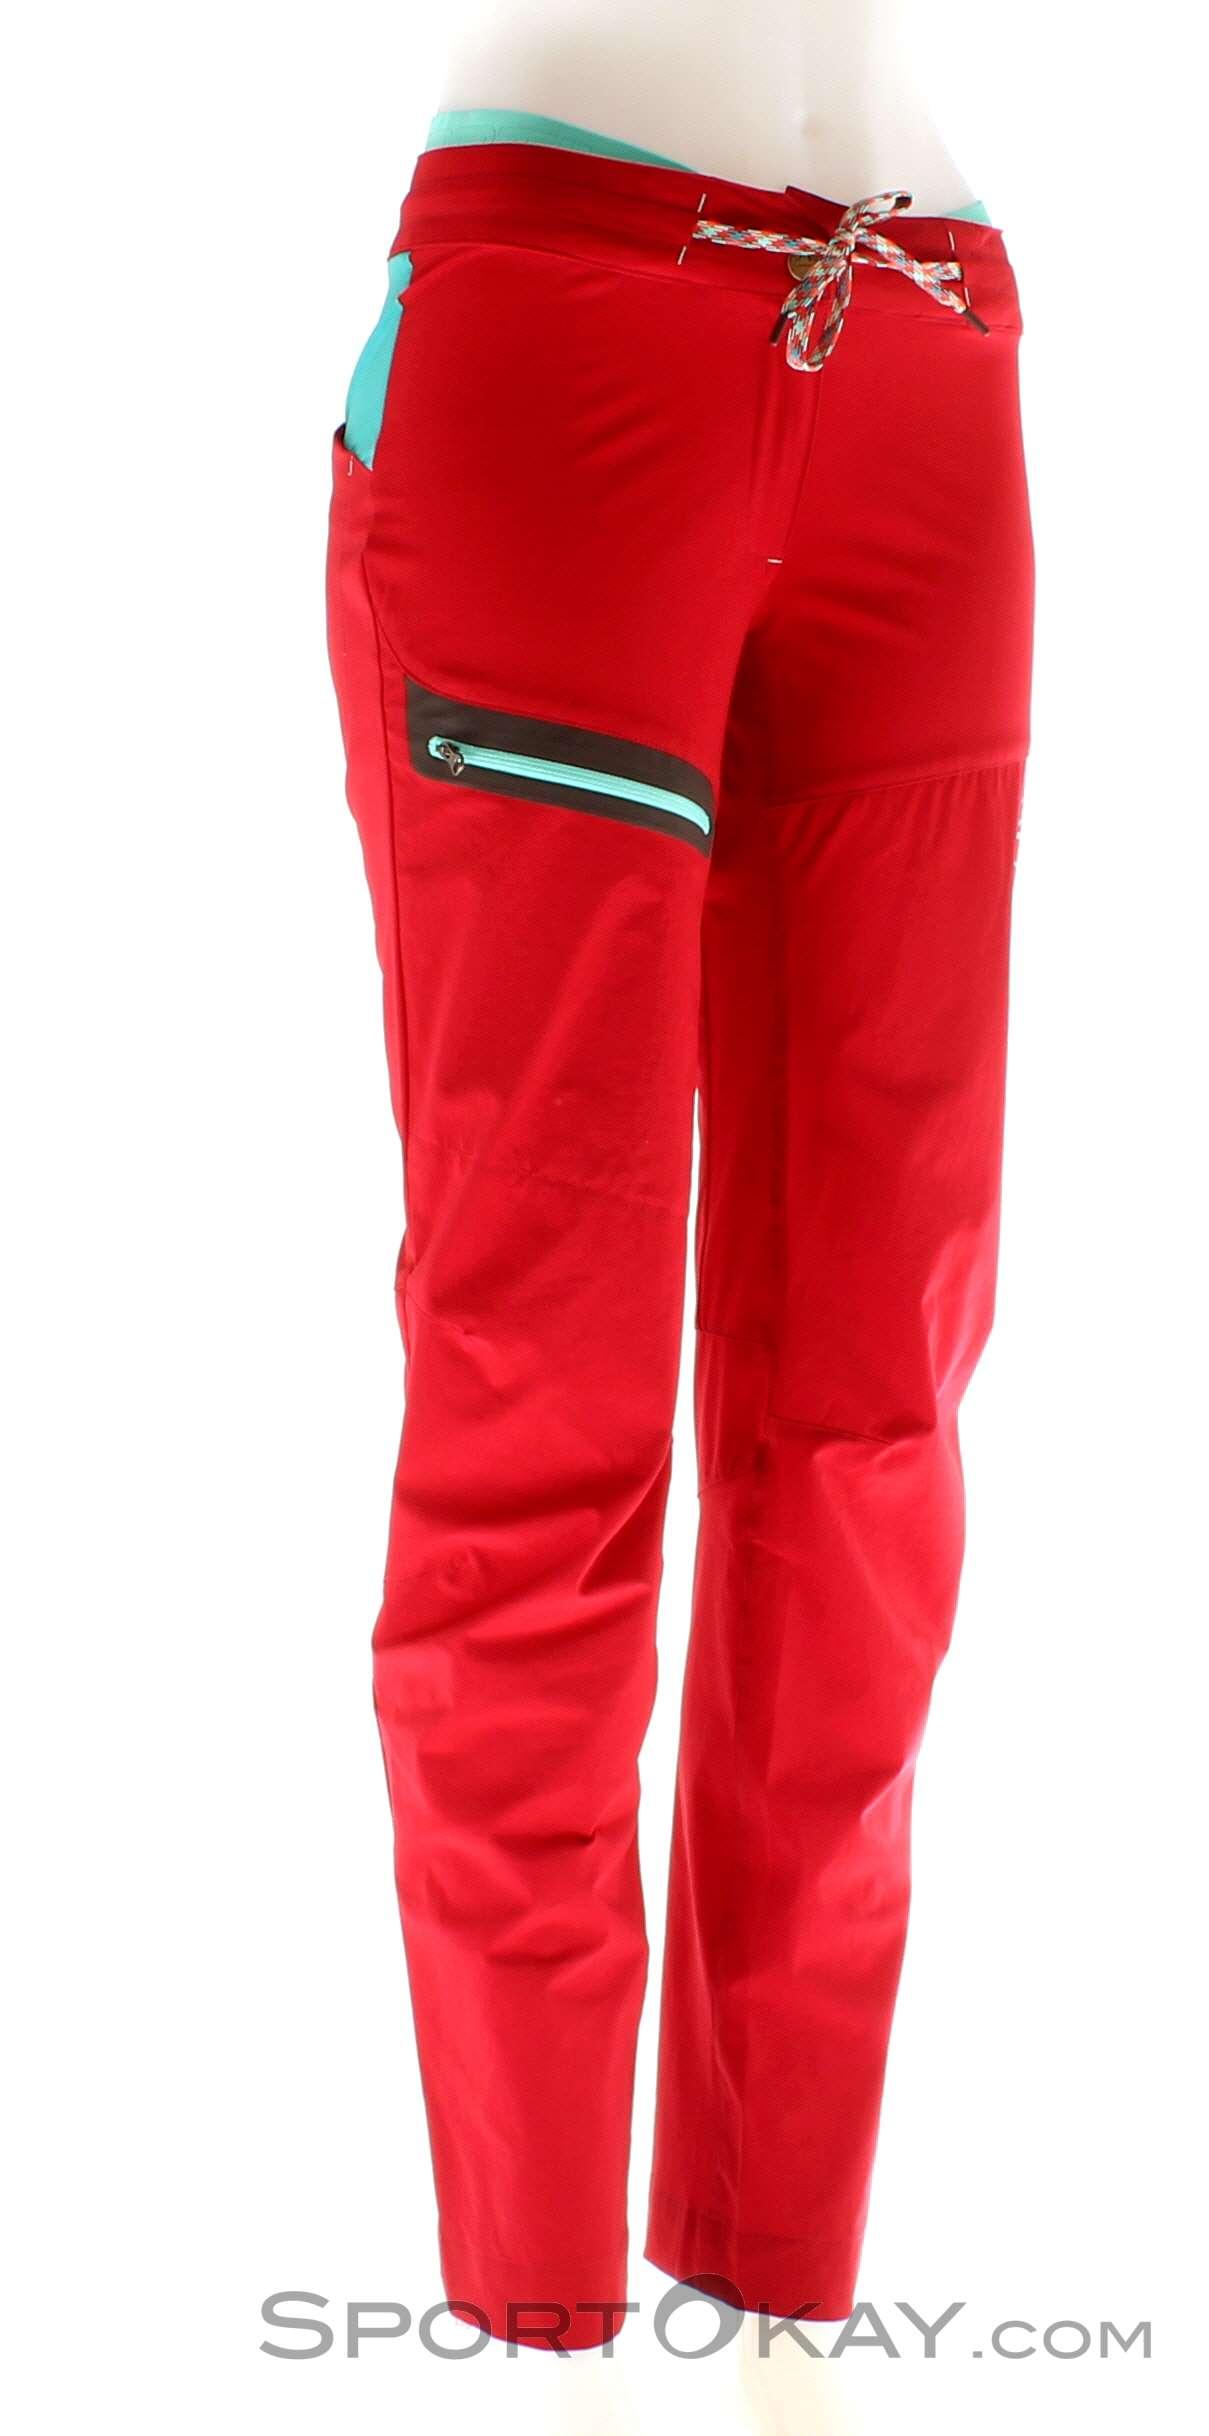 La Sportiva TX Pant Damen Kletterhose, La Sportiva, Pink-Rosa, , Damen, 0024-10326, 5637527109, 801216243881, N1-01.jpg